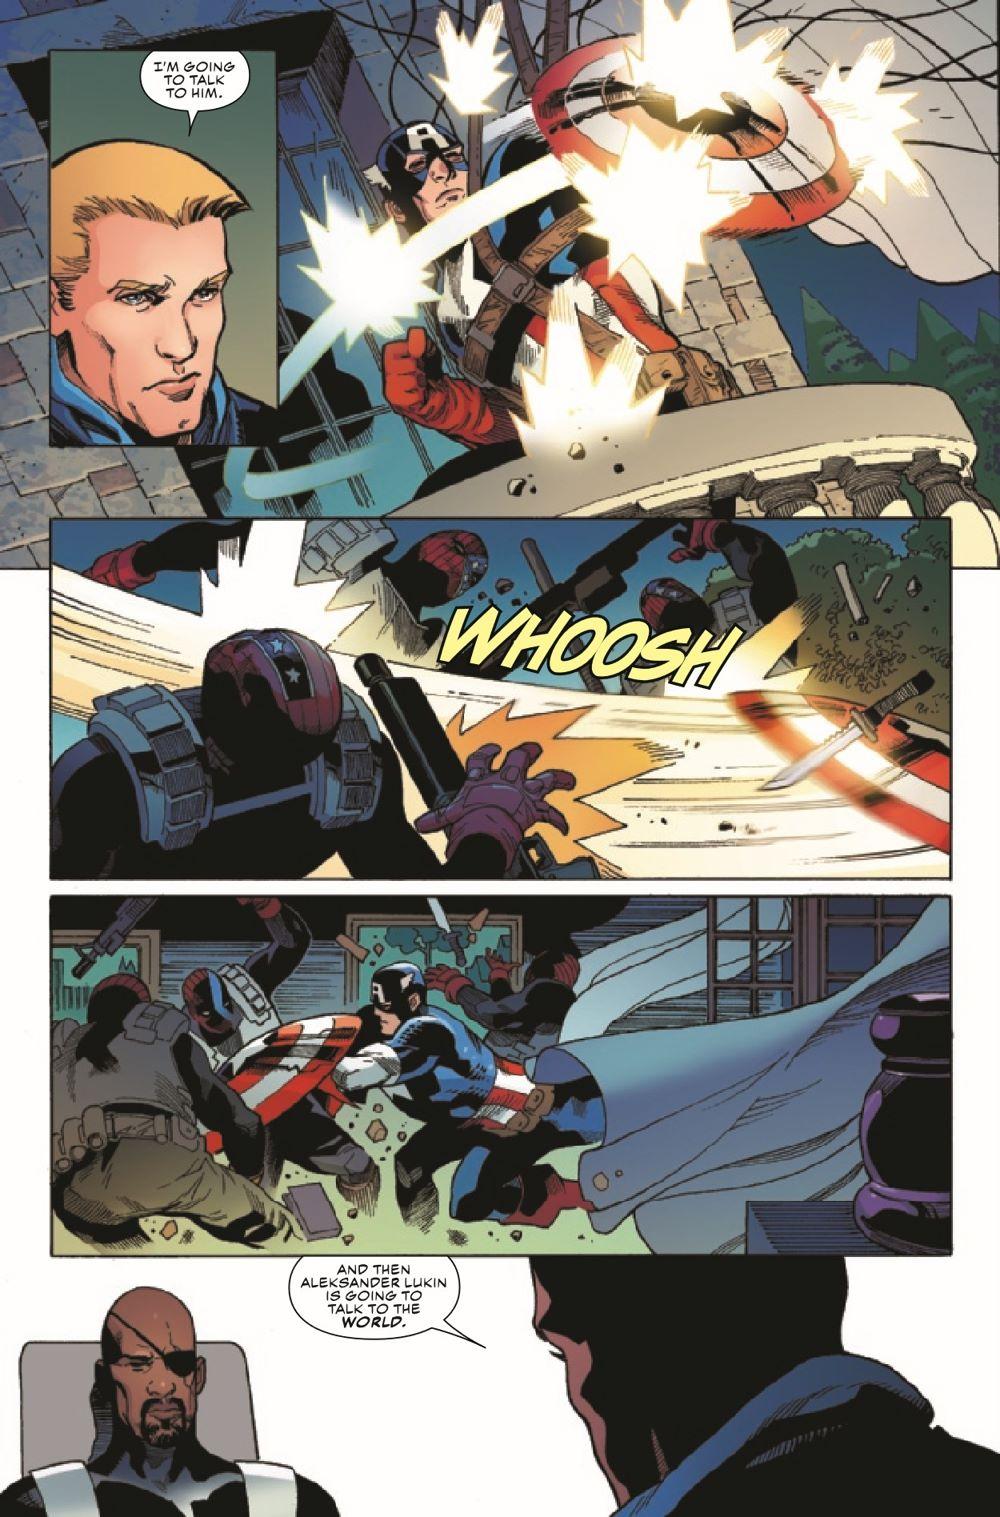 CAPA2018029_Preview-5 ComicList Previews: CAPTAIN AMERICA #29